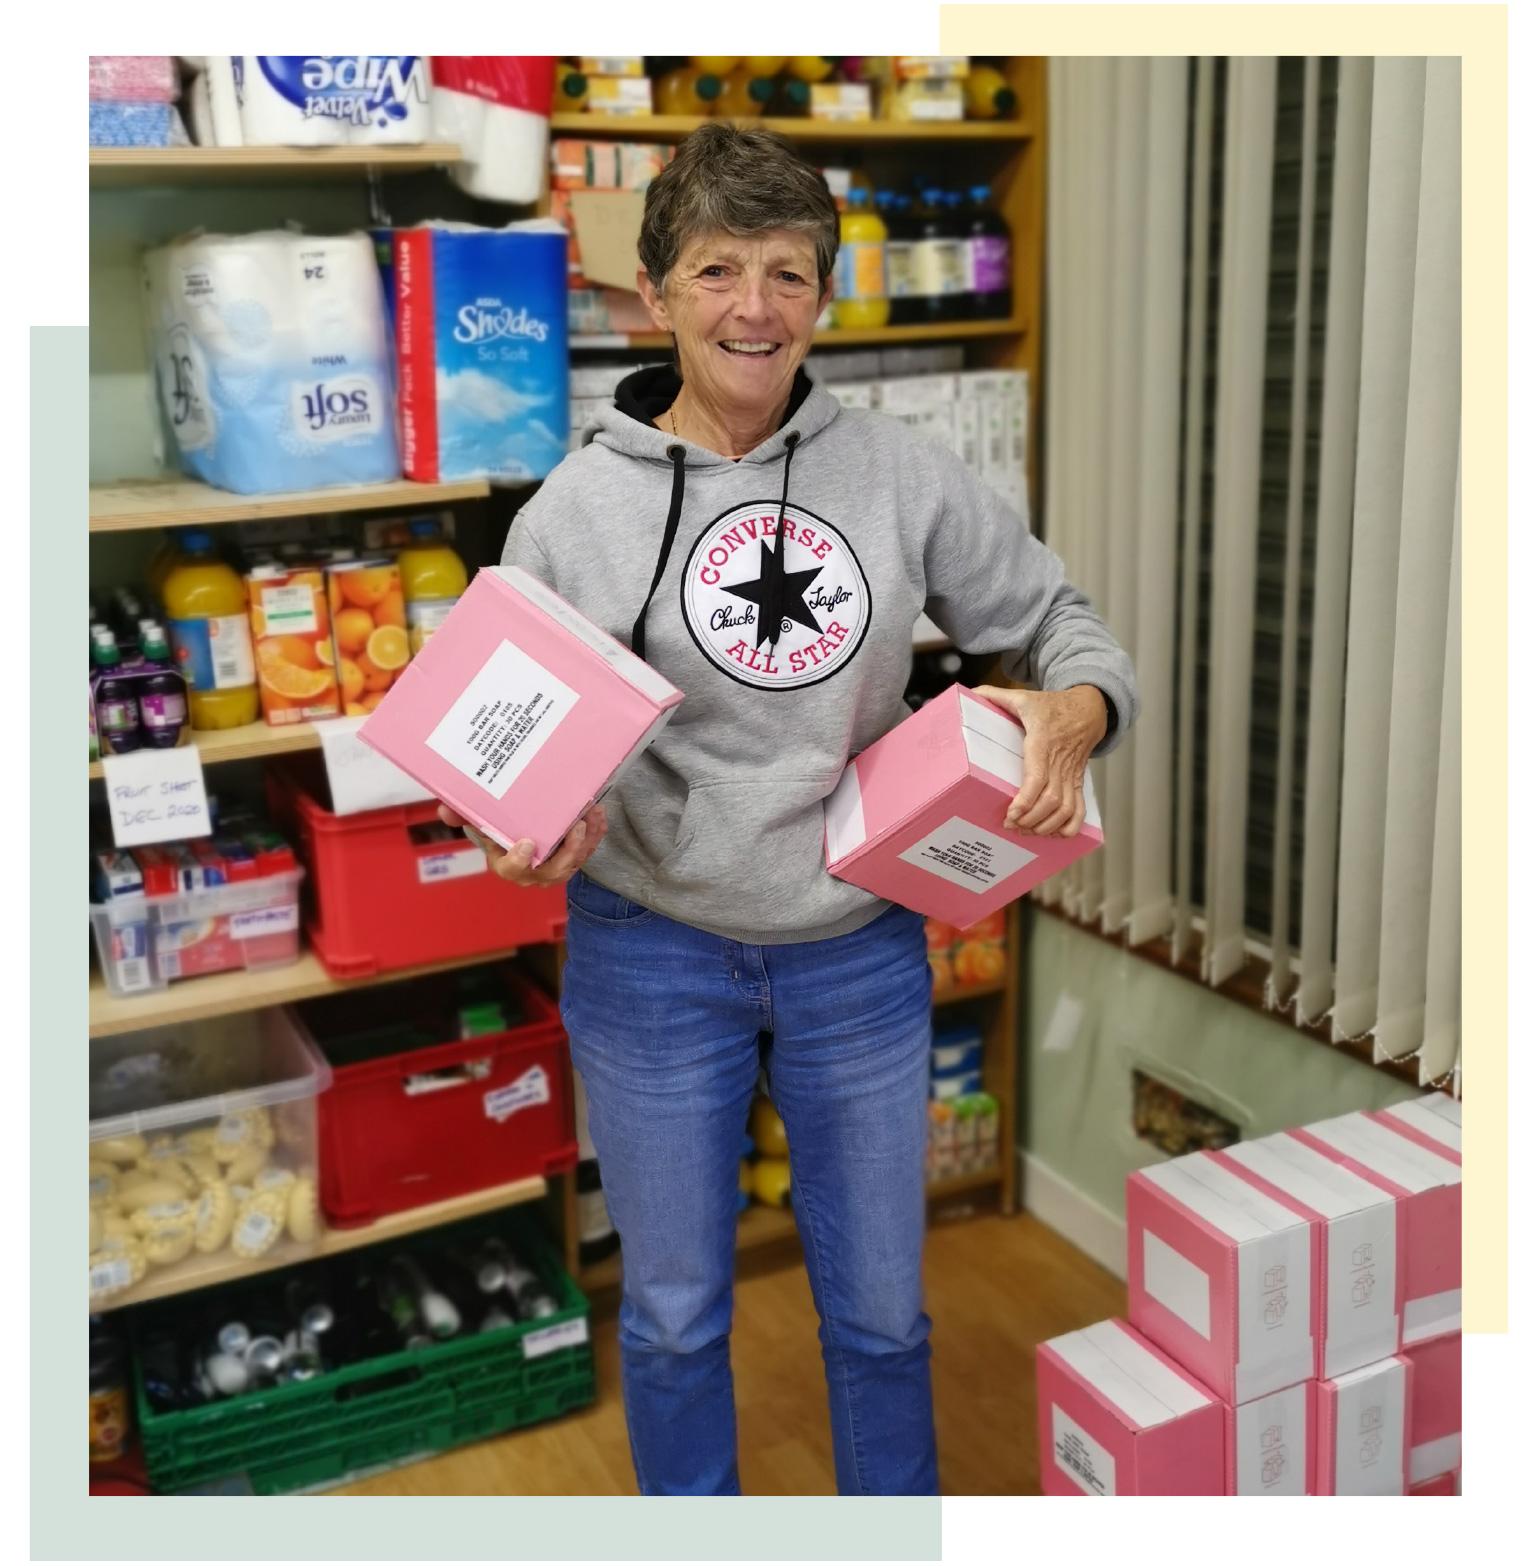 Volunteer receiving soap for local food bank